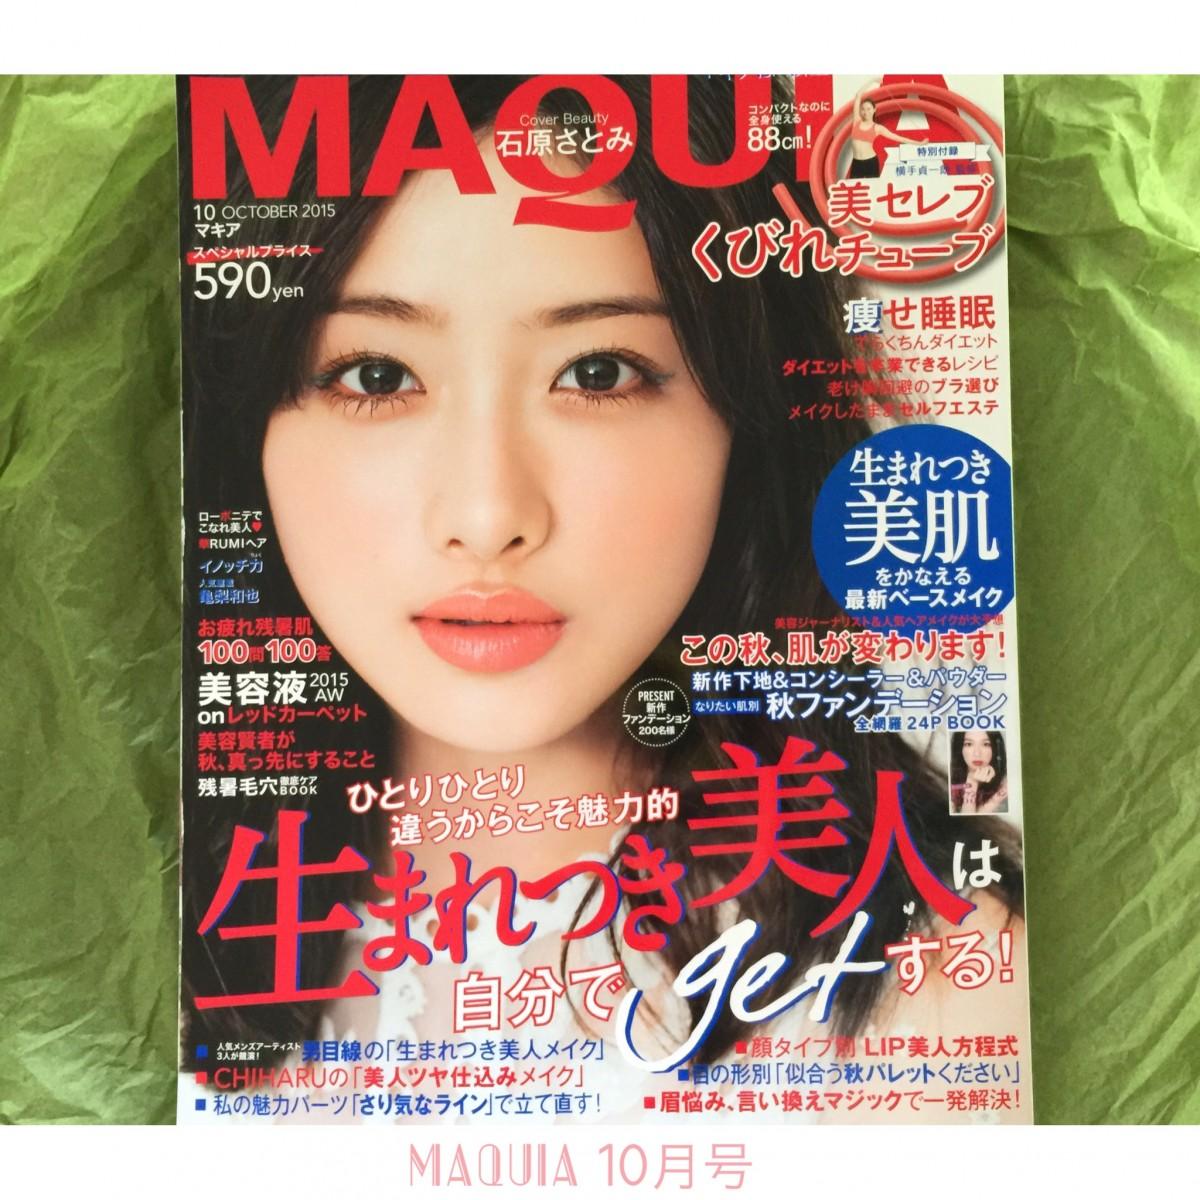 mimiのMAQUIA10月号見どころ♡〜生まれつき美人は自分でgetする〜